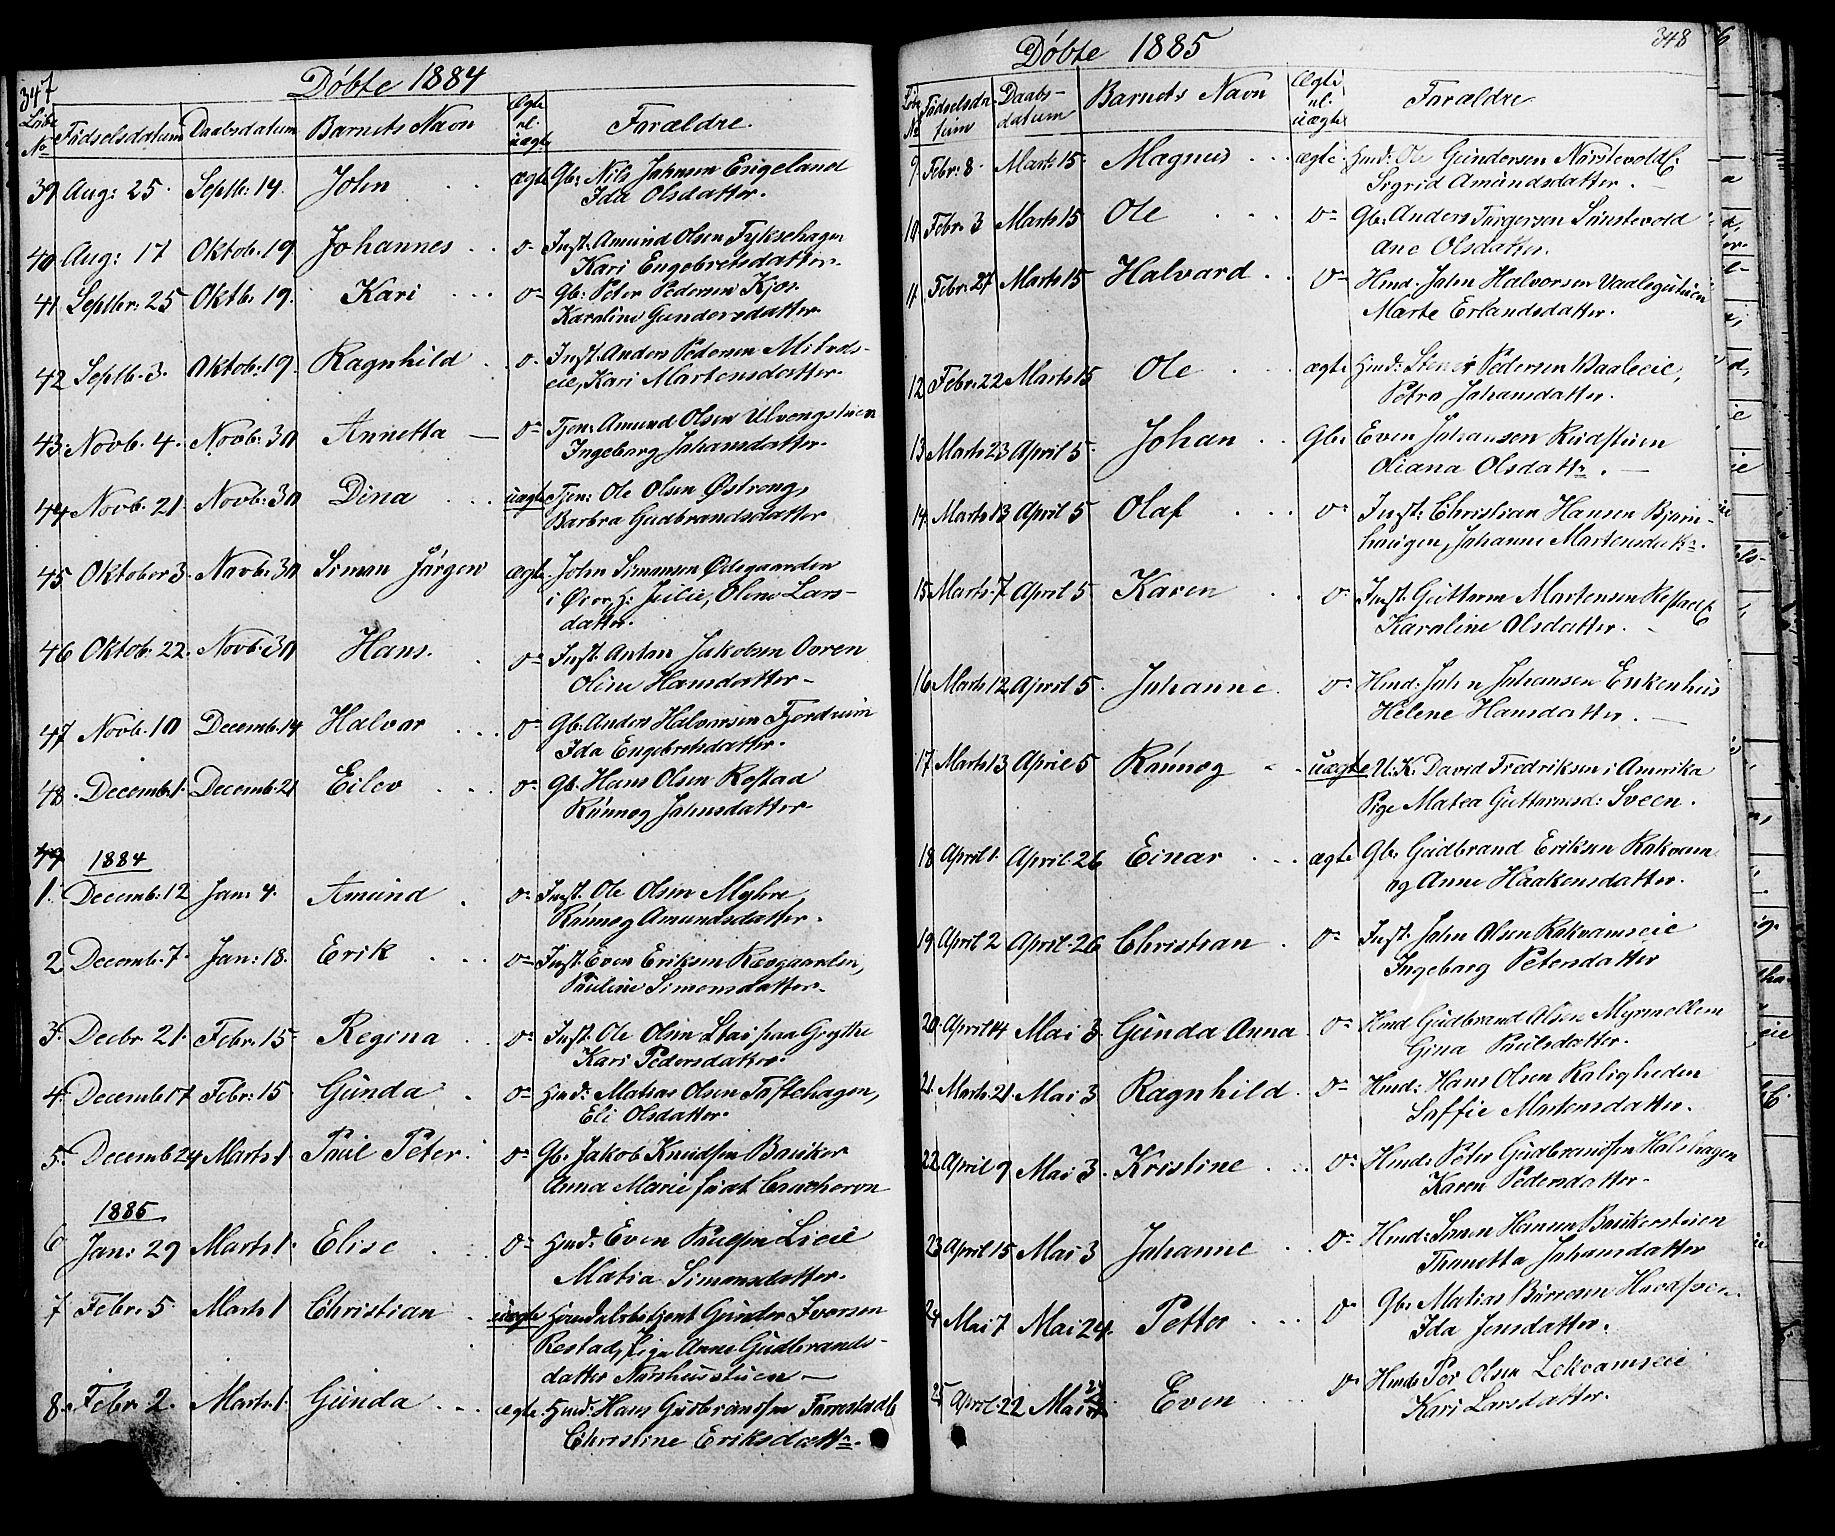 SAH, Østre Gausdal prestekontor, Klokkerbok nr. 1, 1863-1893, s. 347-348